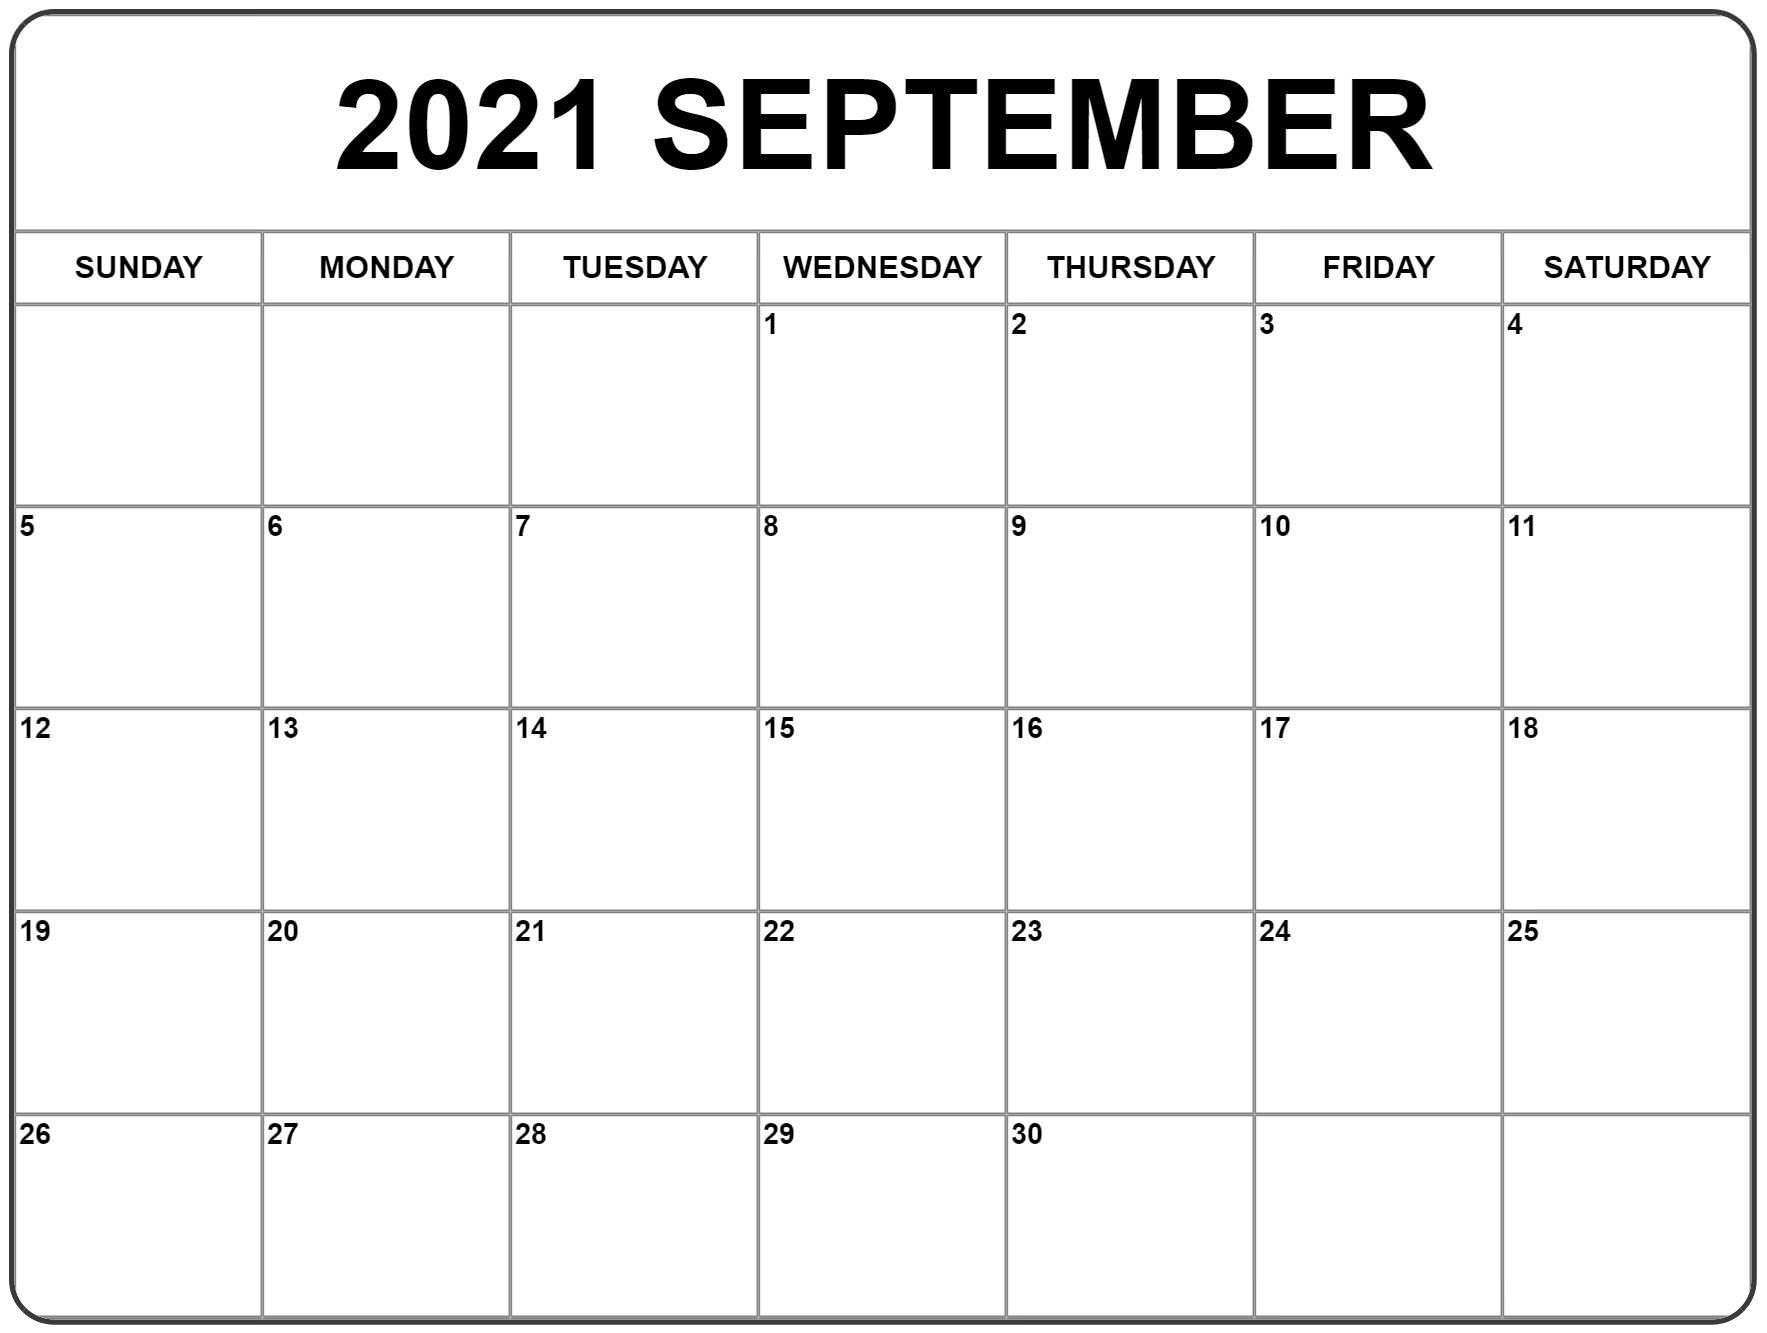 2021 September Calendar PDF